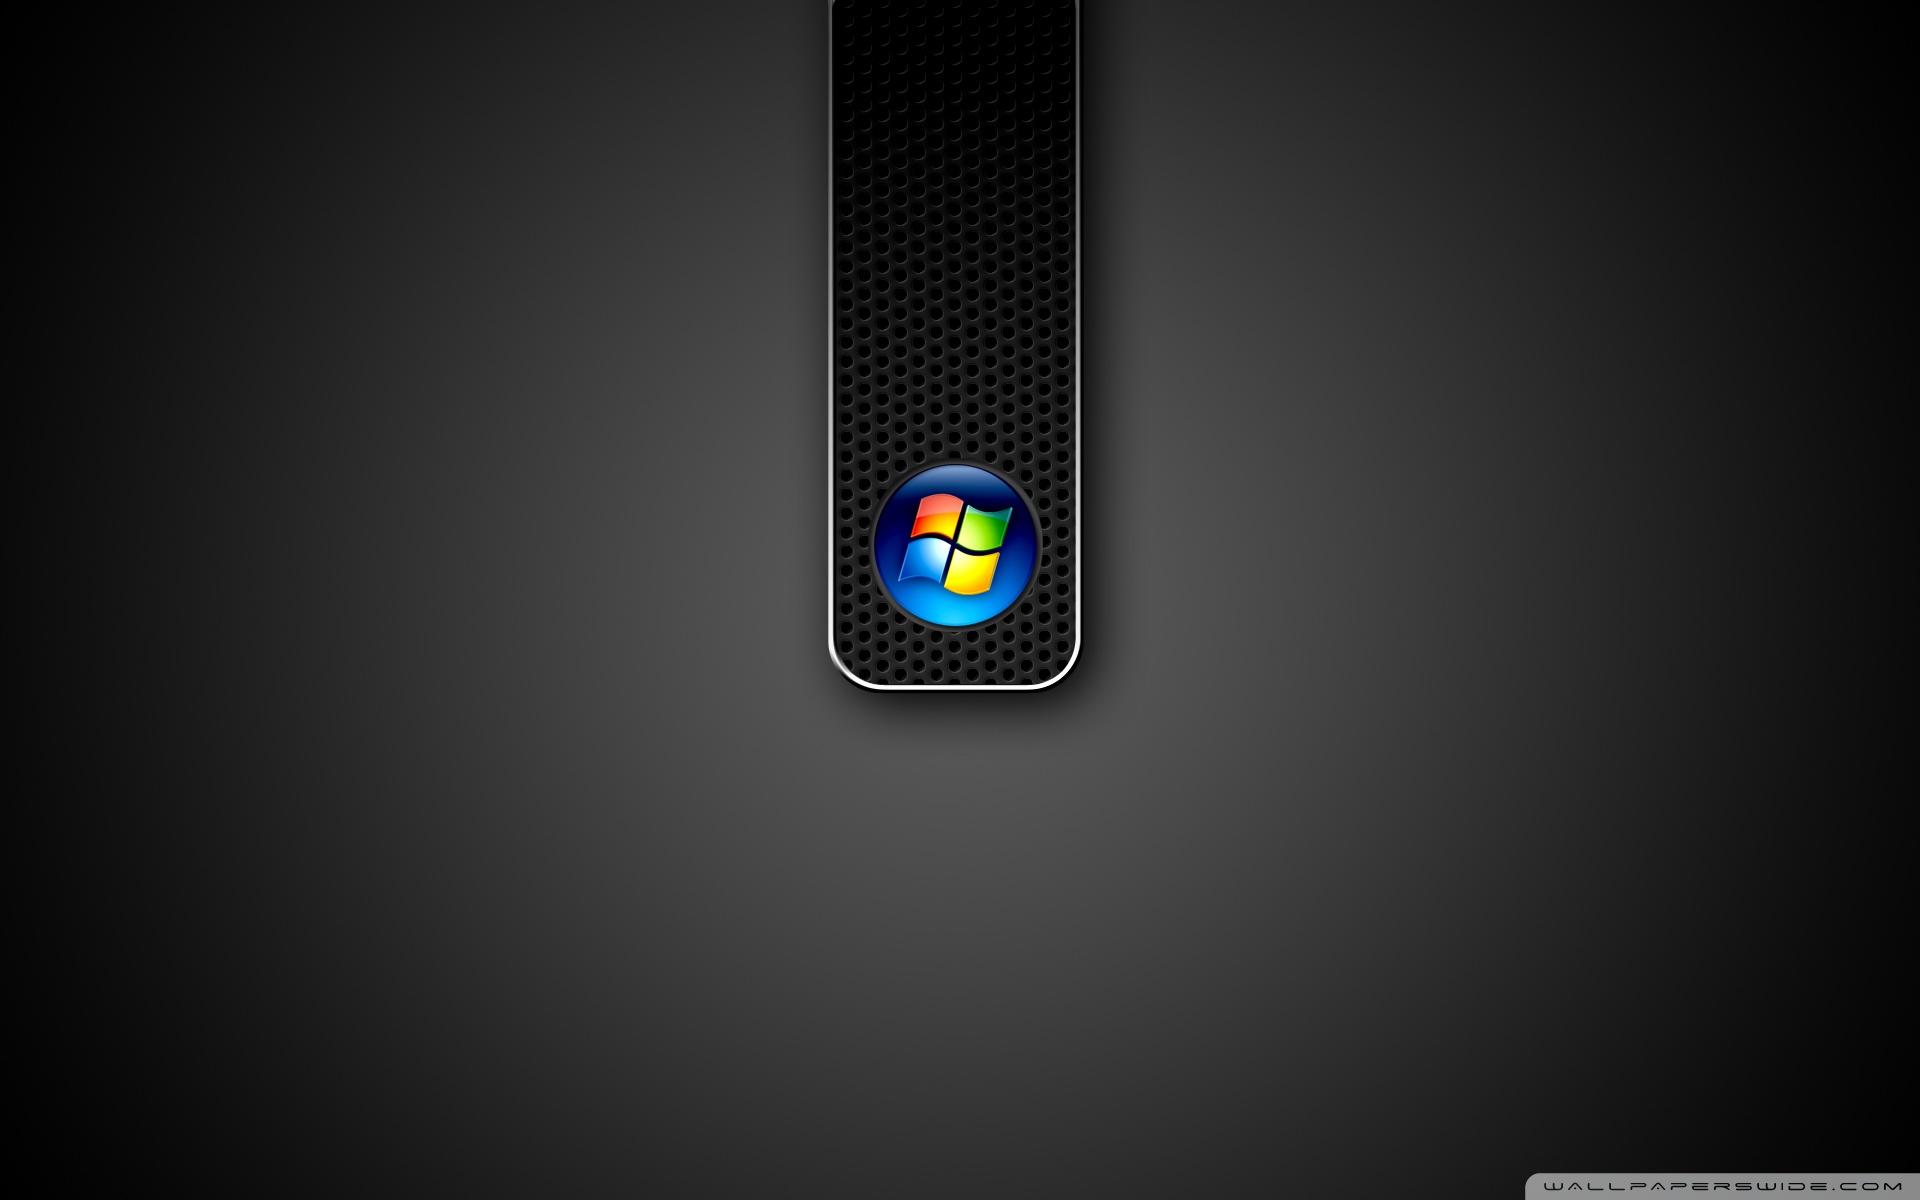 Download Windows Vista Wallpaper Hd Hd Backgrounds Download